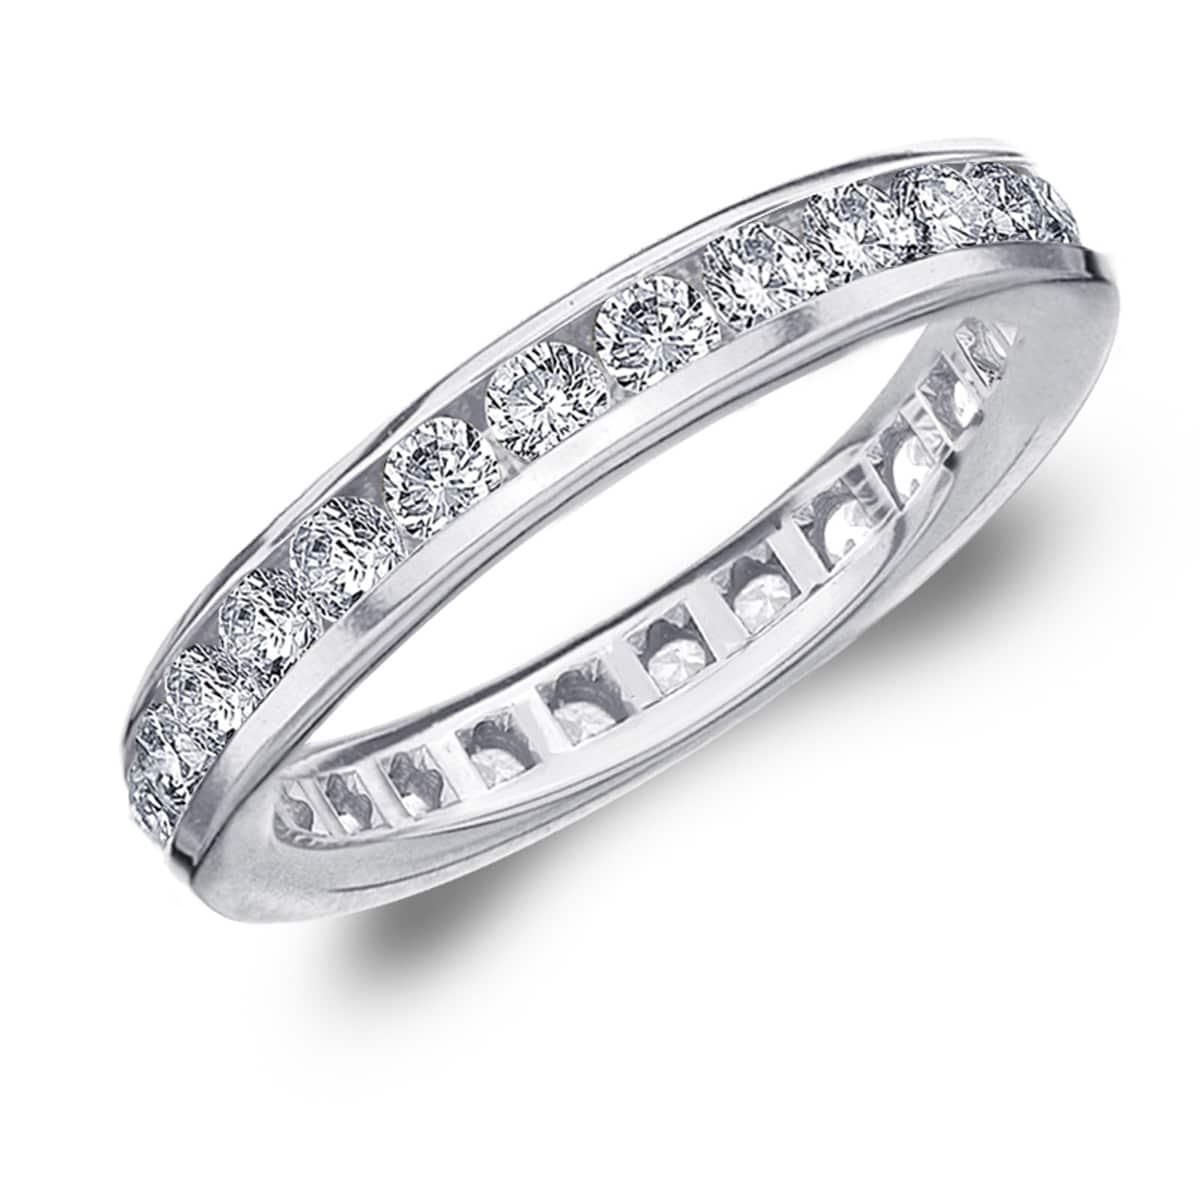 Diamond Wedding Band in 10K White Gold 1//10 cttw, Size-8.25 G-H,I2-I3